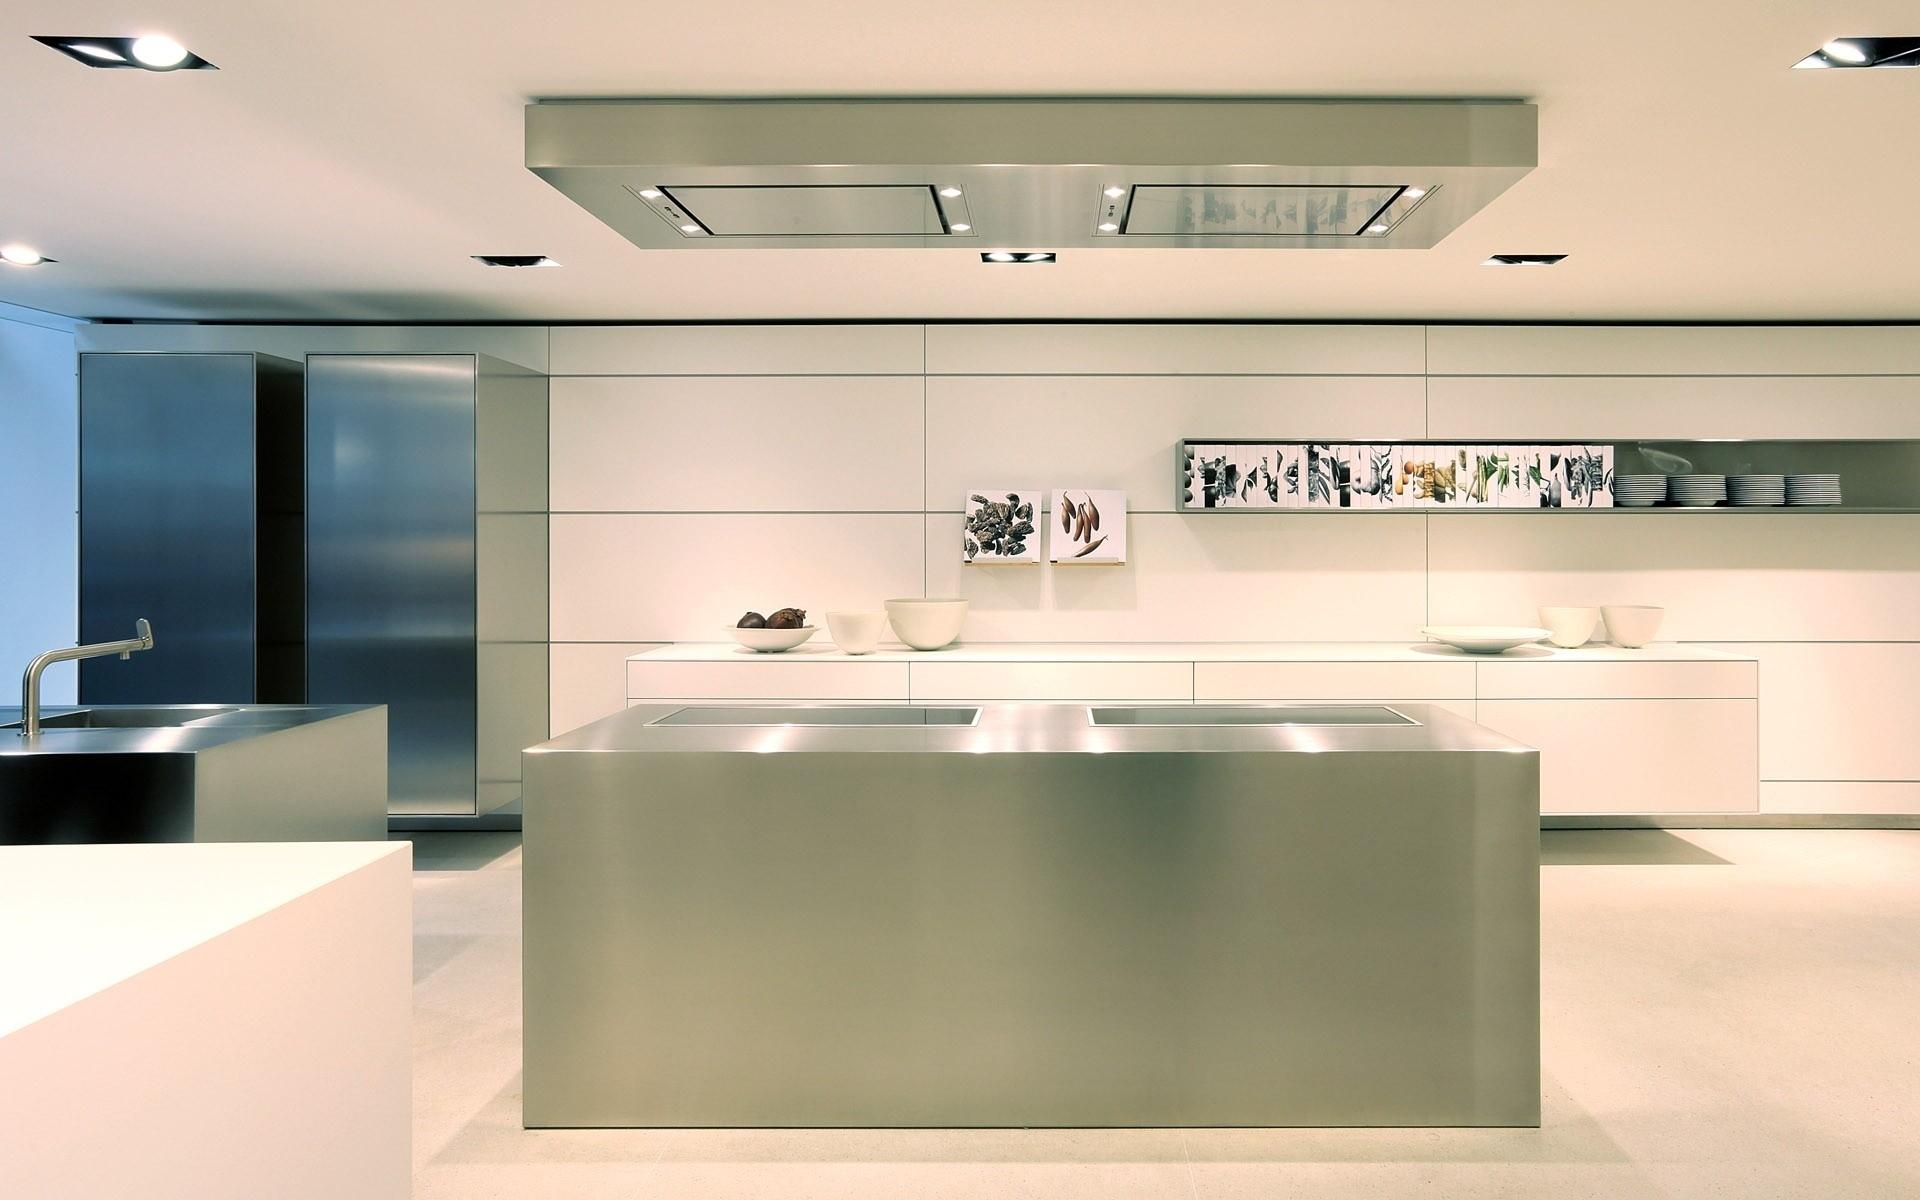 trendy kitchen wallpaper discount kitchens melbourne doorka akrilik kapak and panel türkiye 39nin en